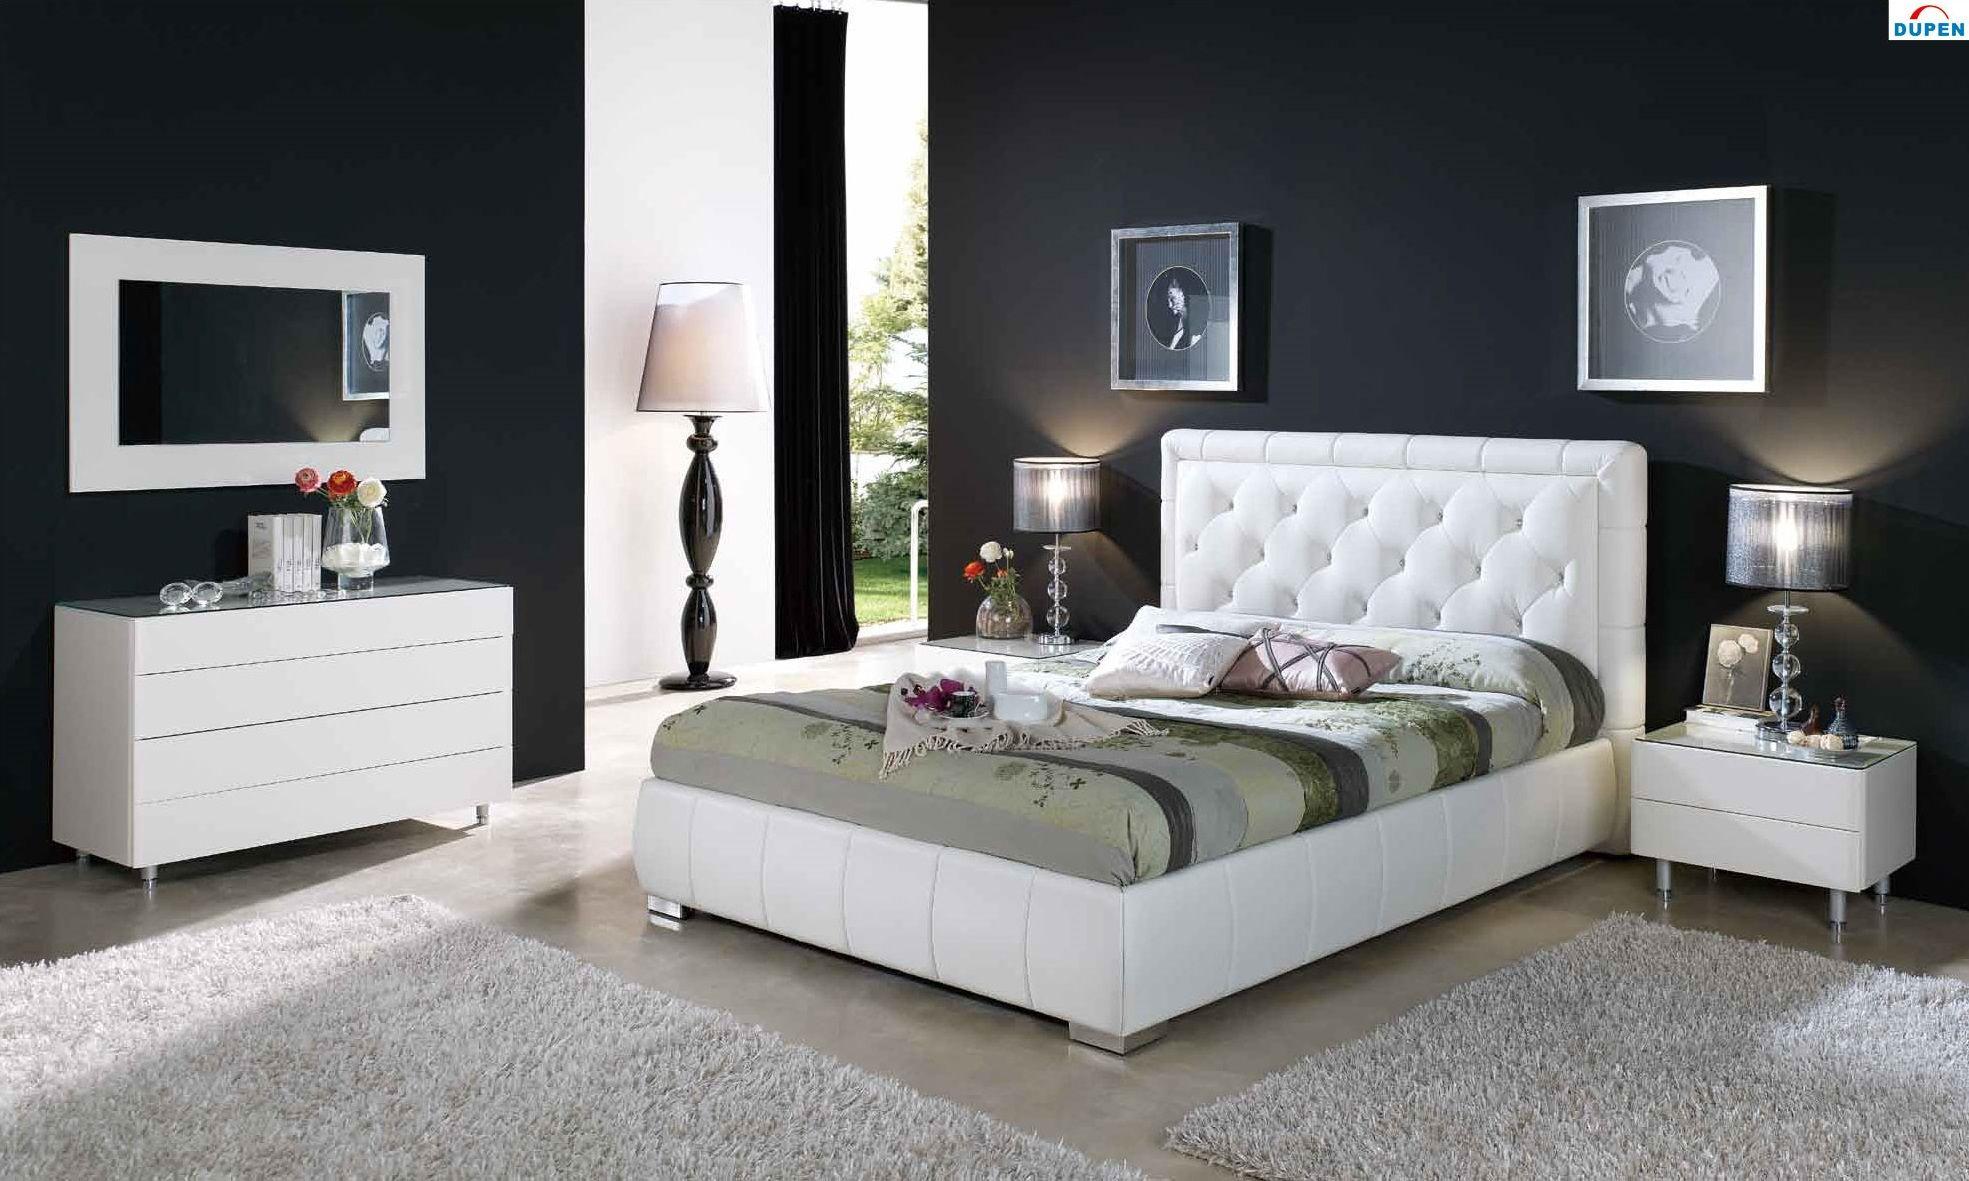 Komplette Schlafzimmer Möbel Sets Modernes schlafzimmer